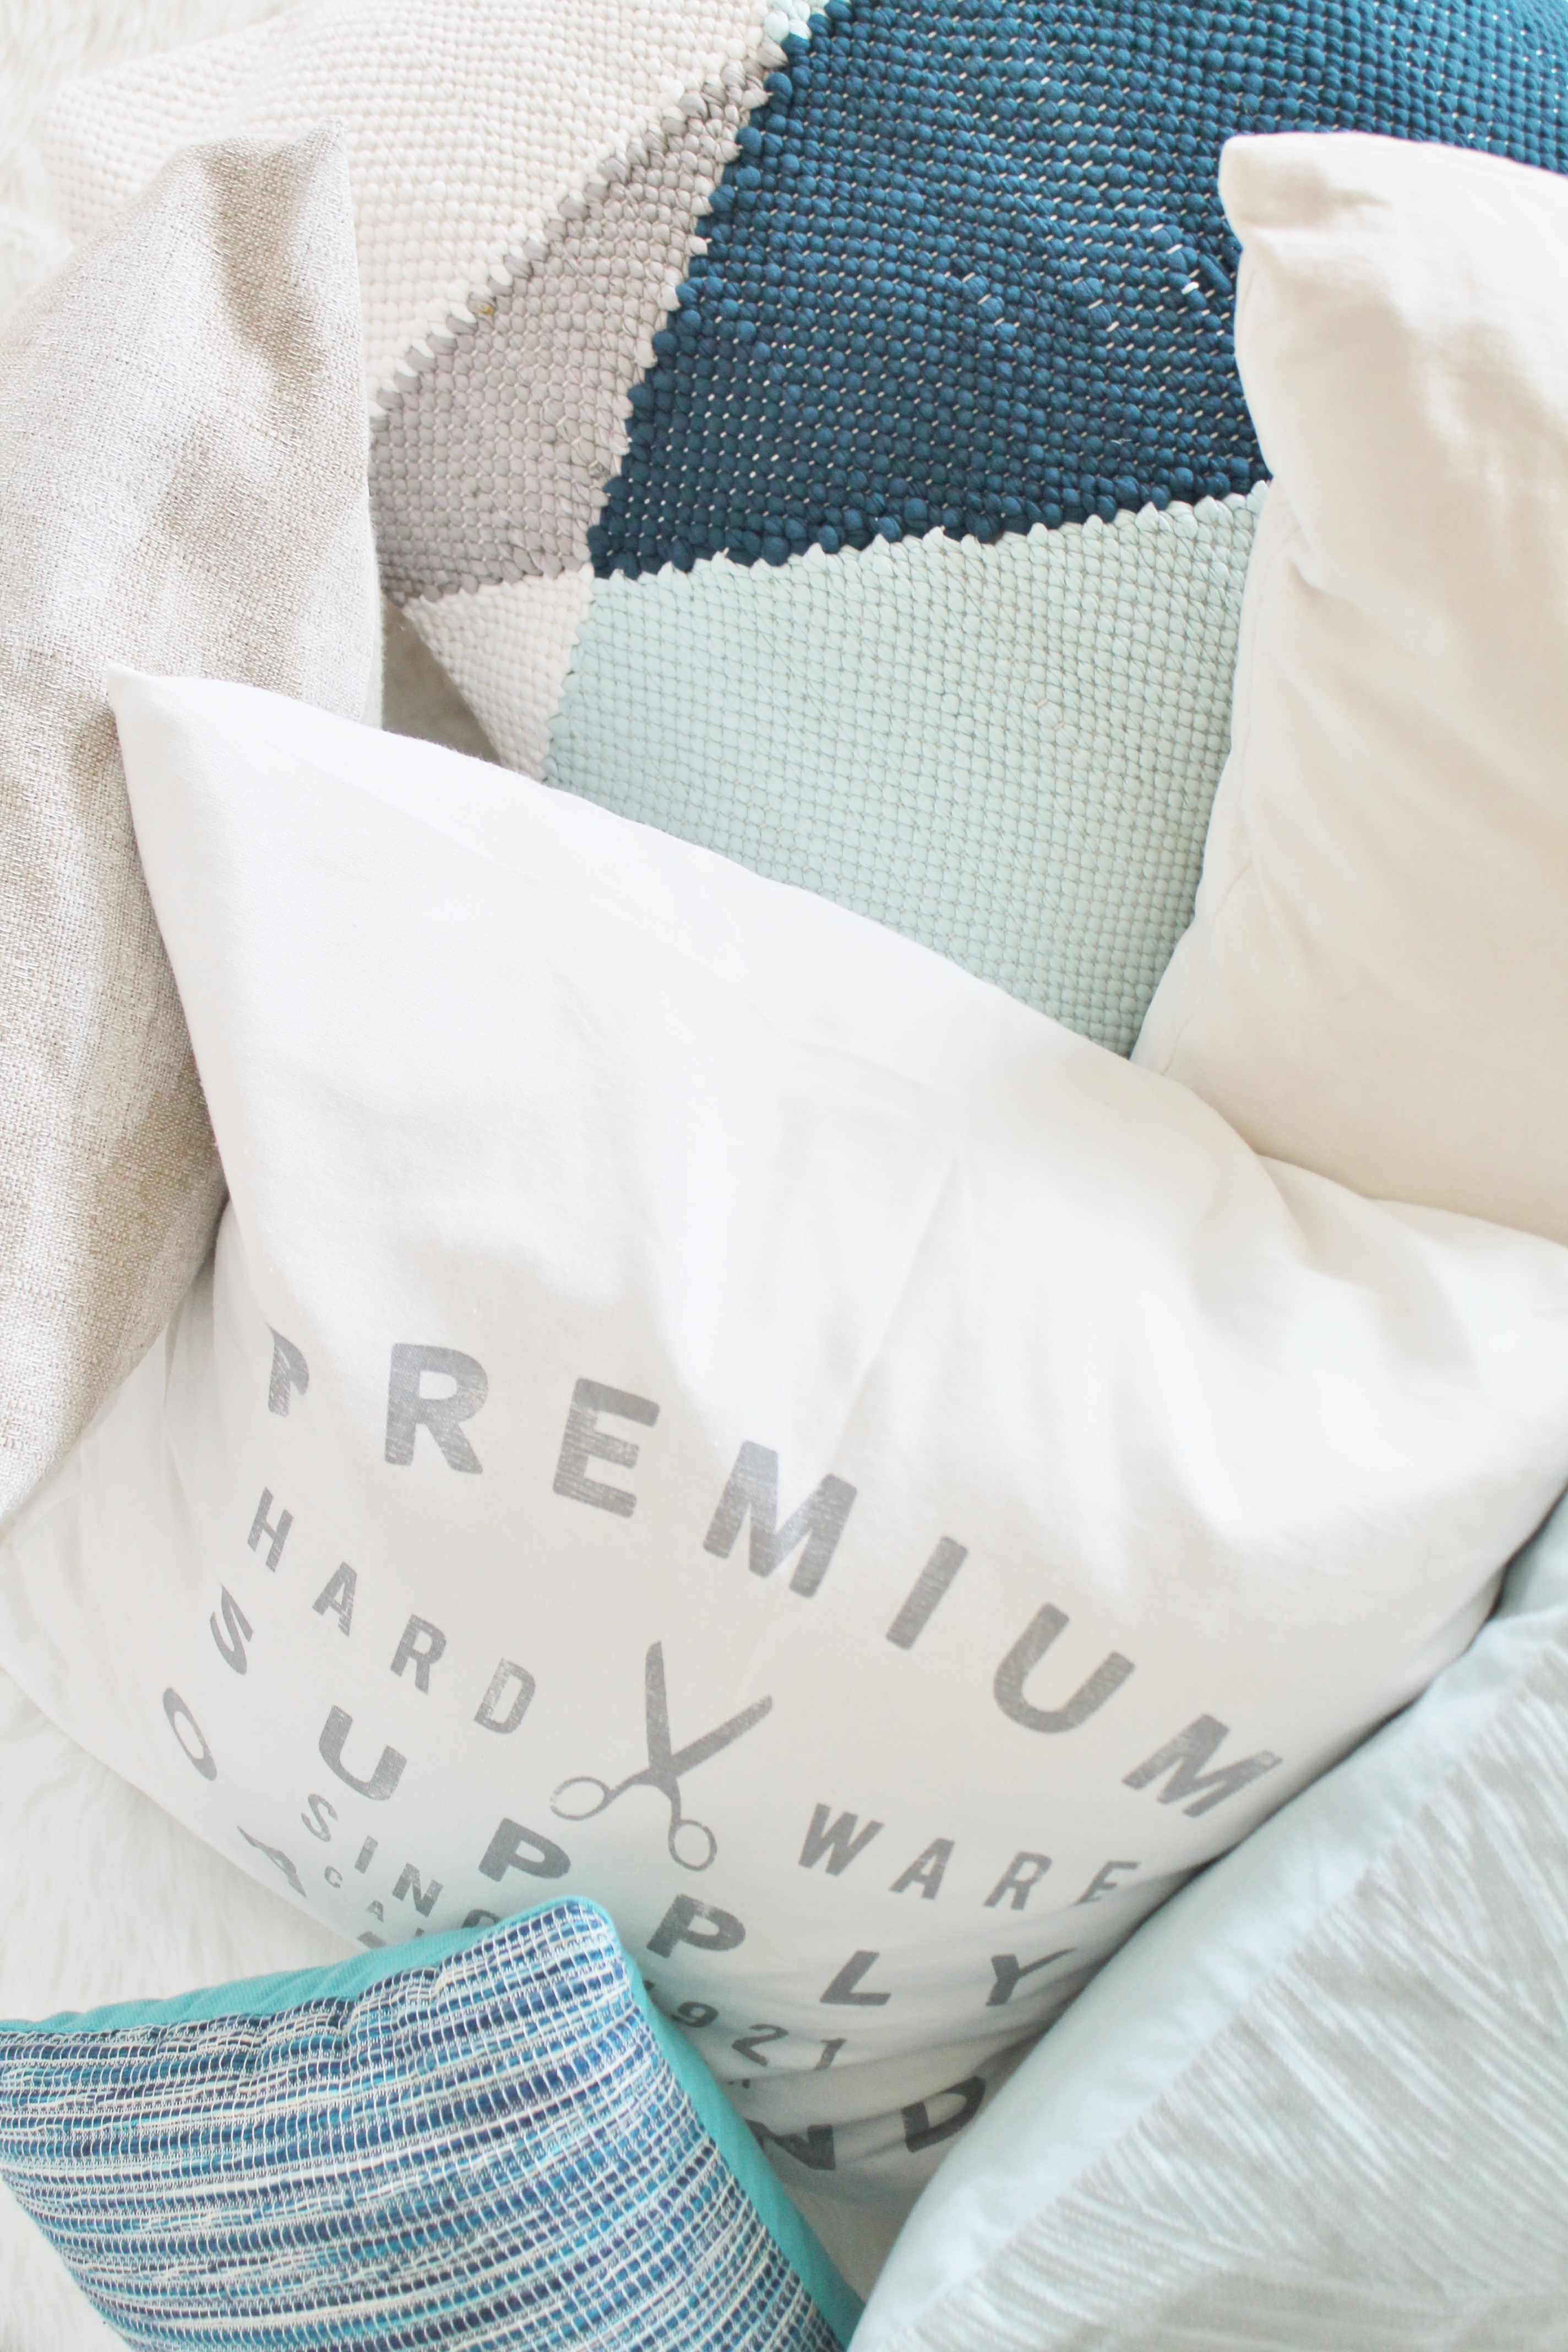 Coastal Farmhouse Get The Look With Pillows